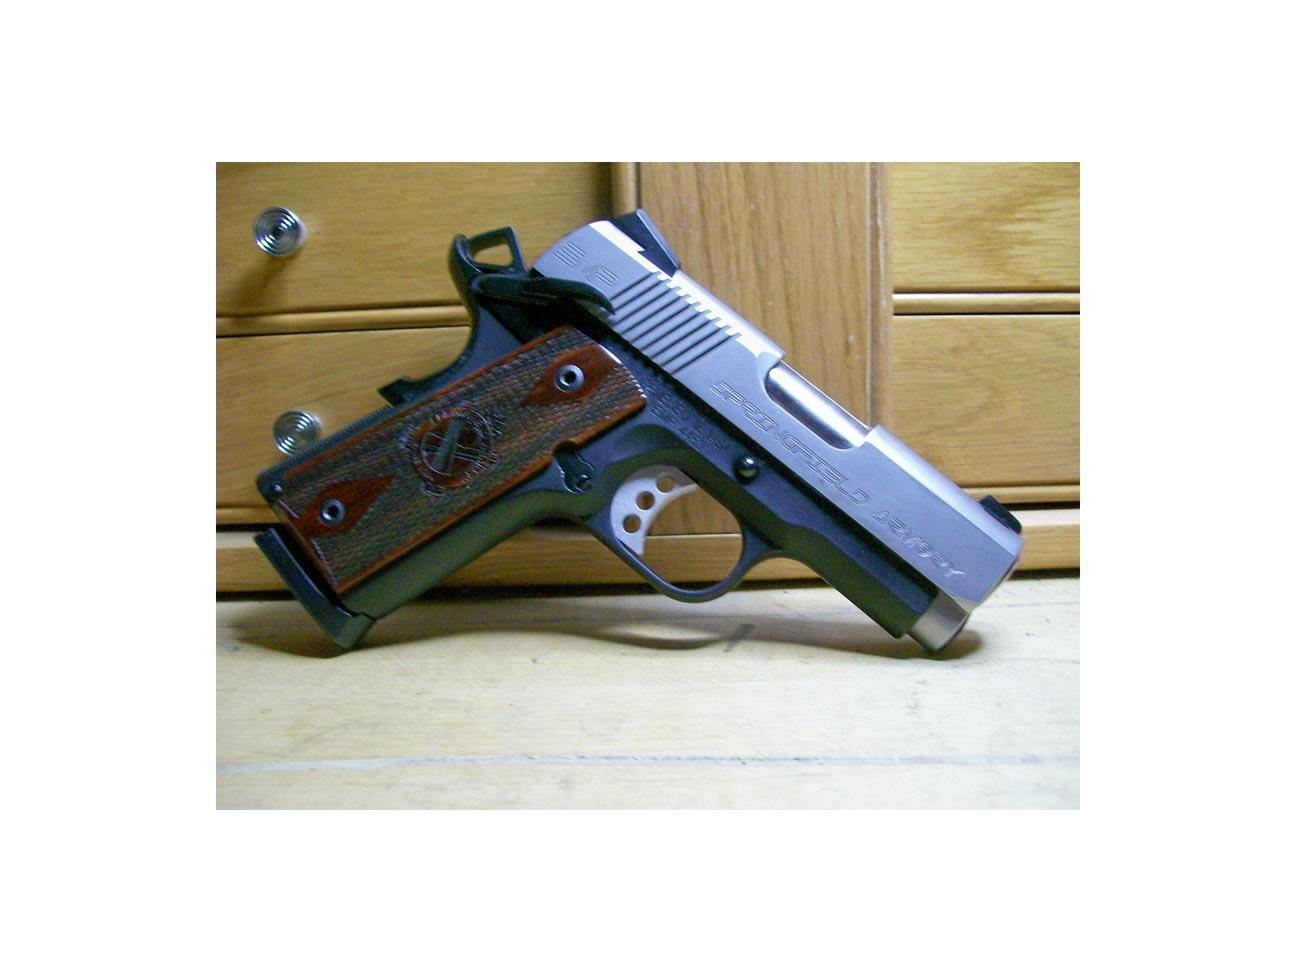 My new favorite carry gun- Springfield Armory EMP-springfield-emp.jpg